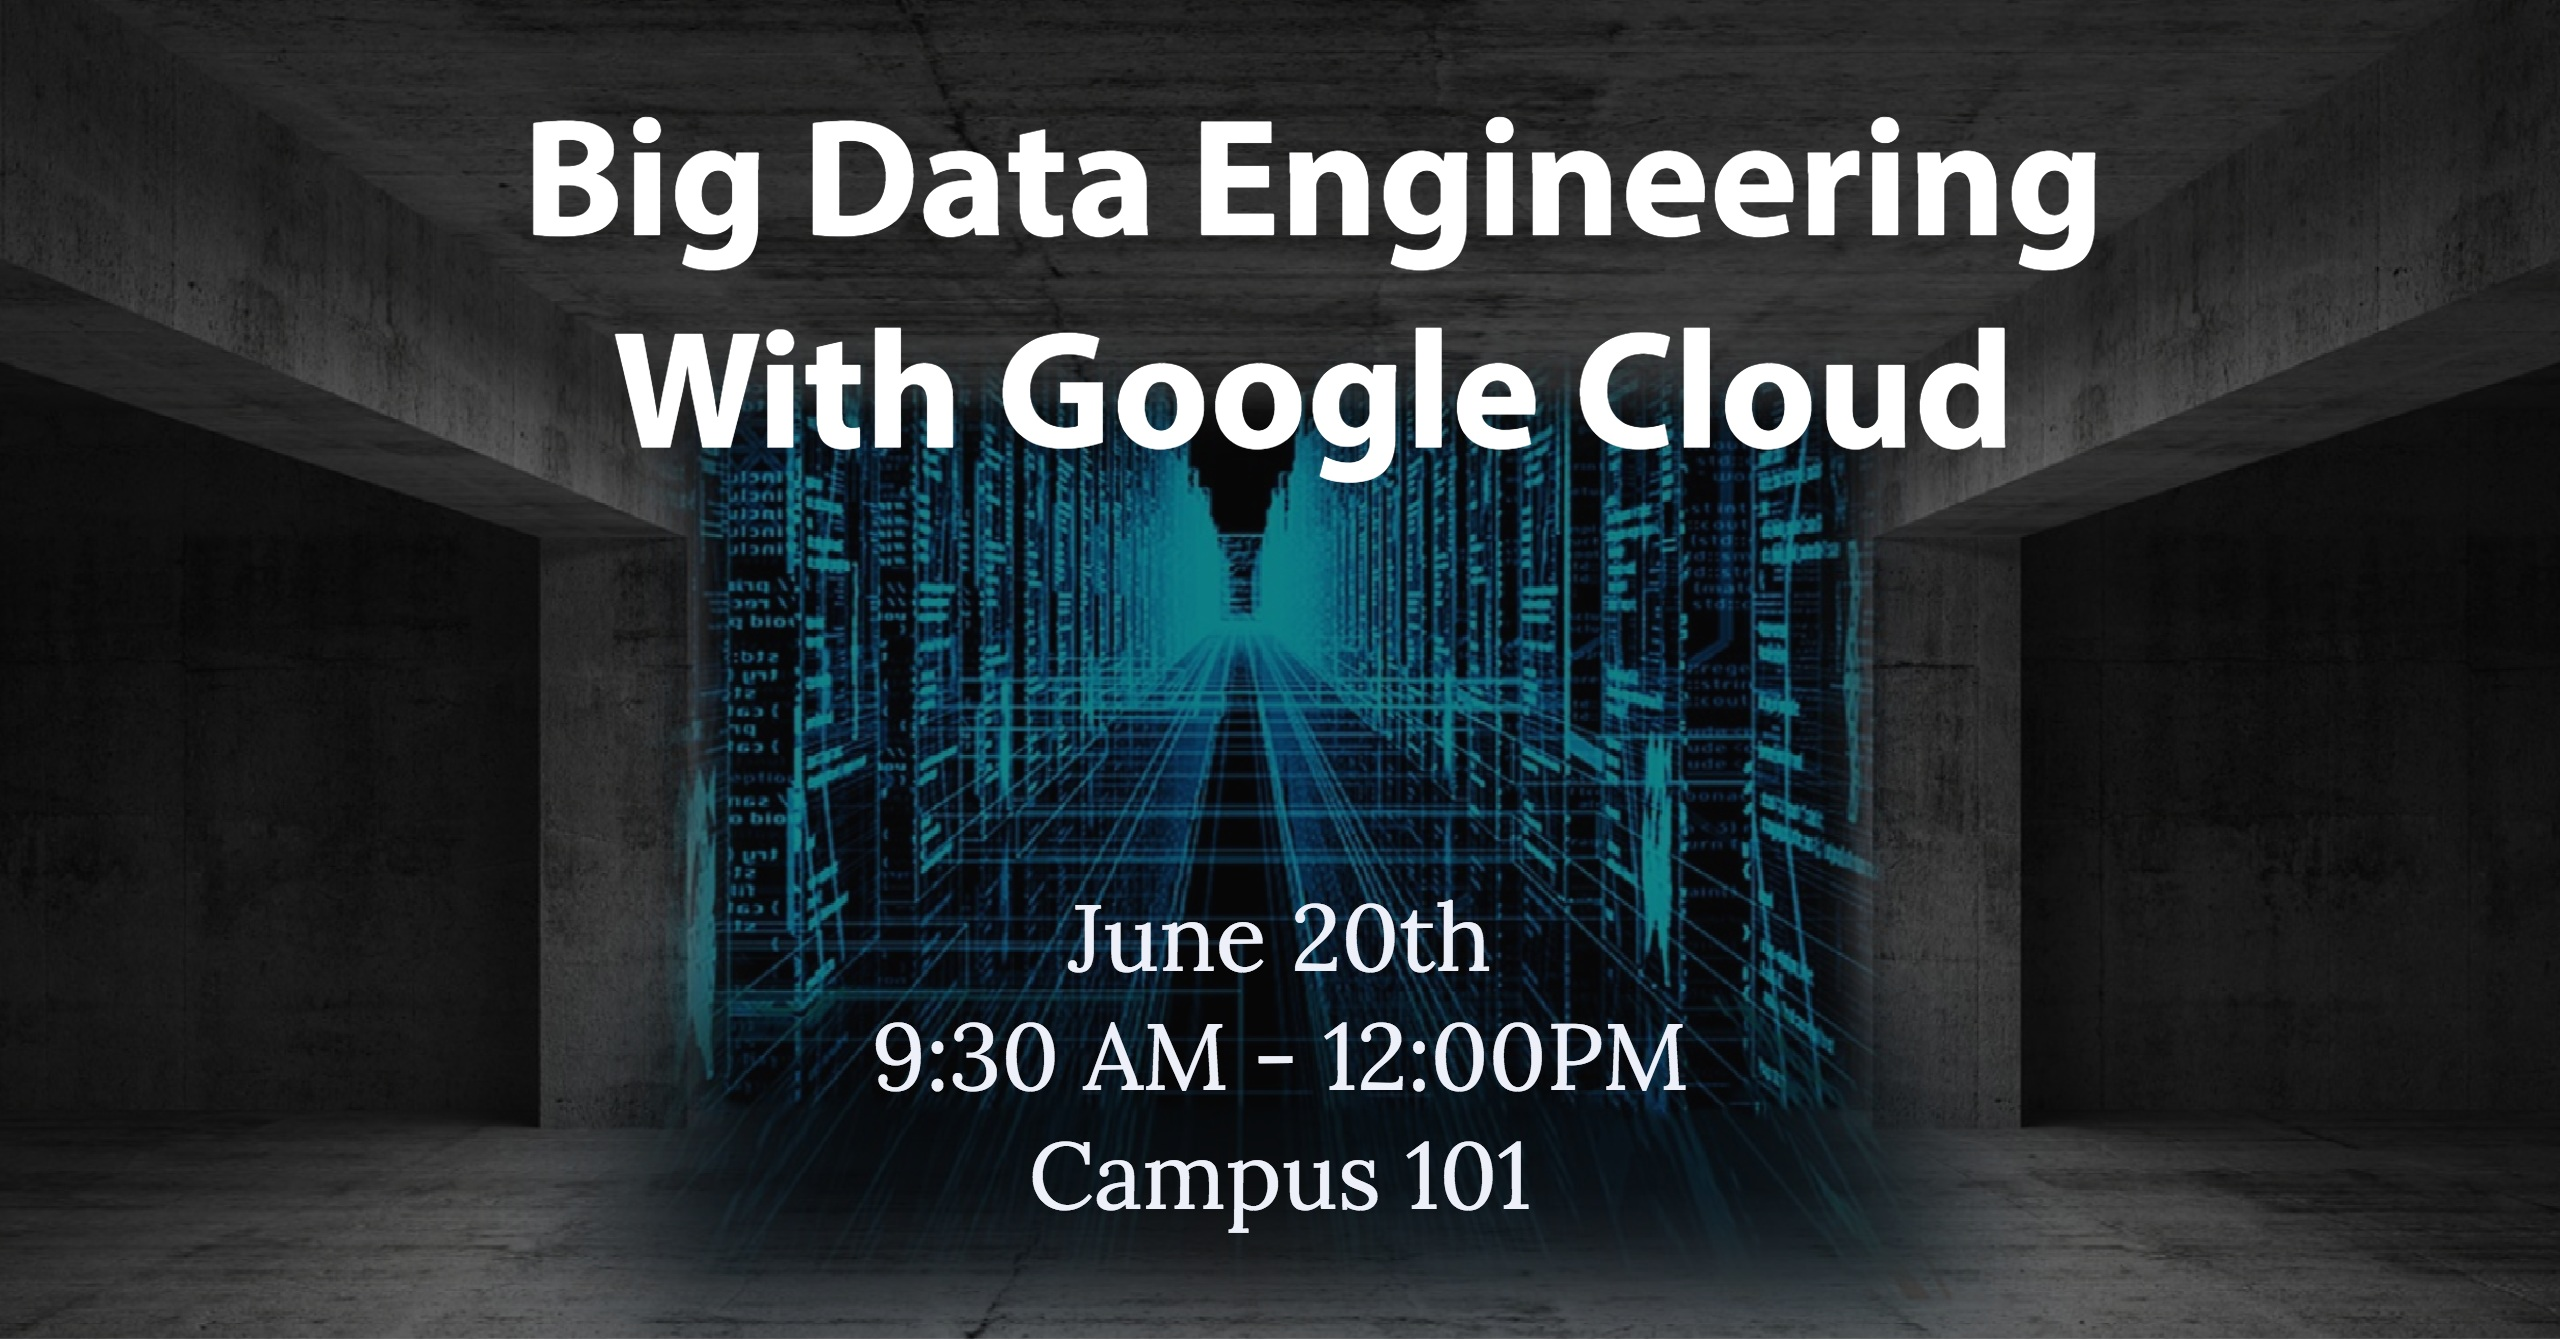 Big Data Engineering With Google Cloud 4.jpg